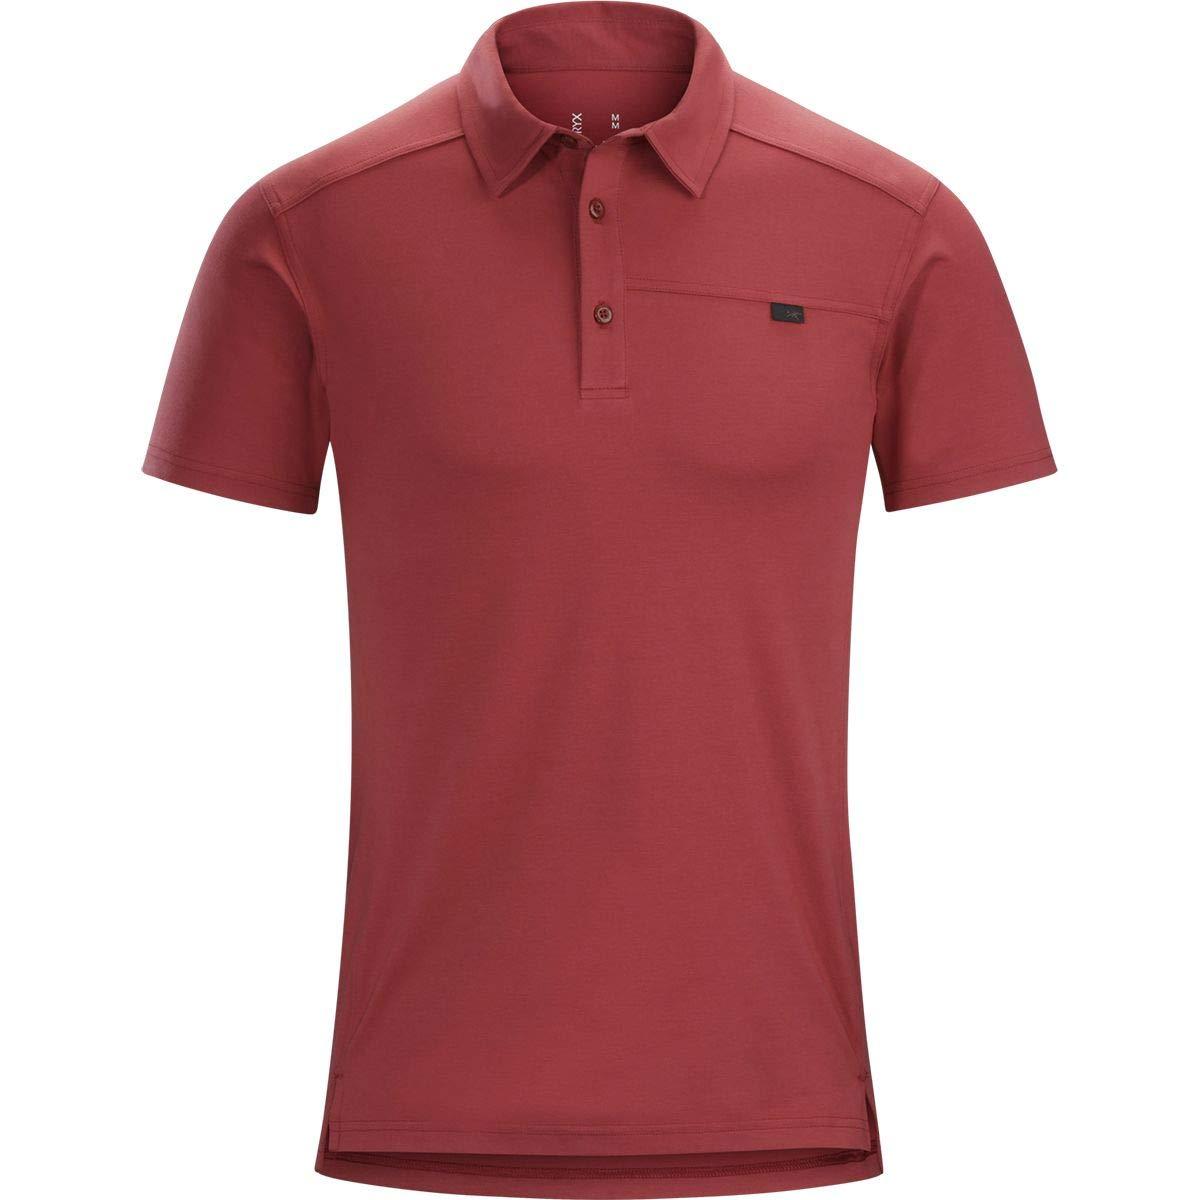 8856a1d7 Amazon.com: Arc'teryx Captive Polo Shirt Short Sleeve Men's: Clothing